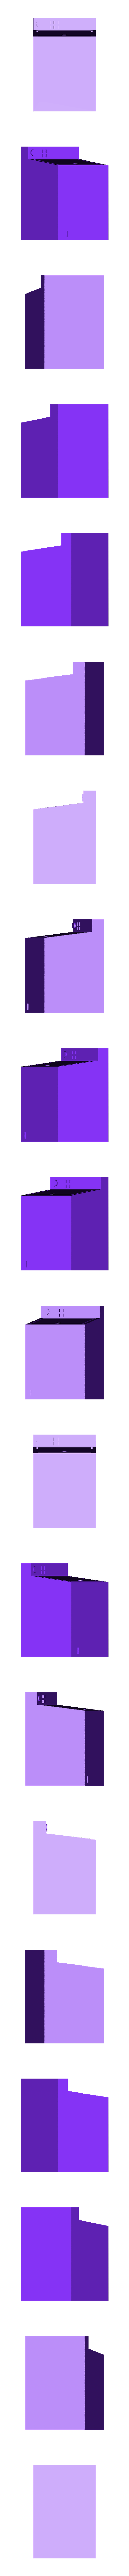 WashingMachine.stl Download free STL file Rick and Morty Garage • 3D printable object, lucadilorenzo98